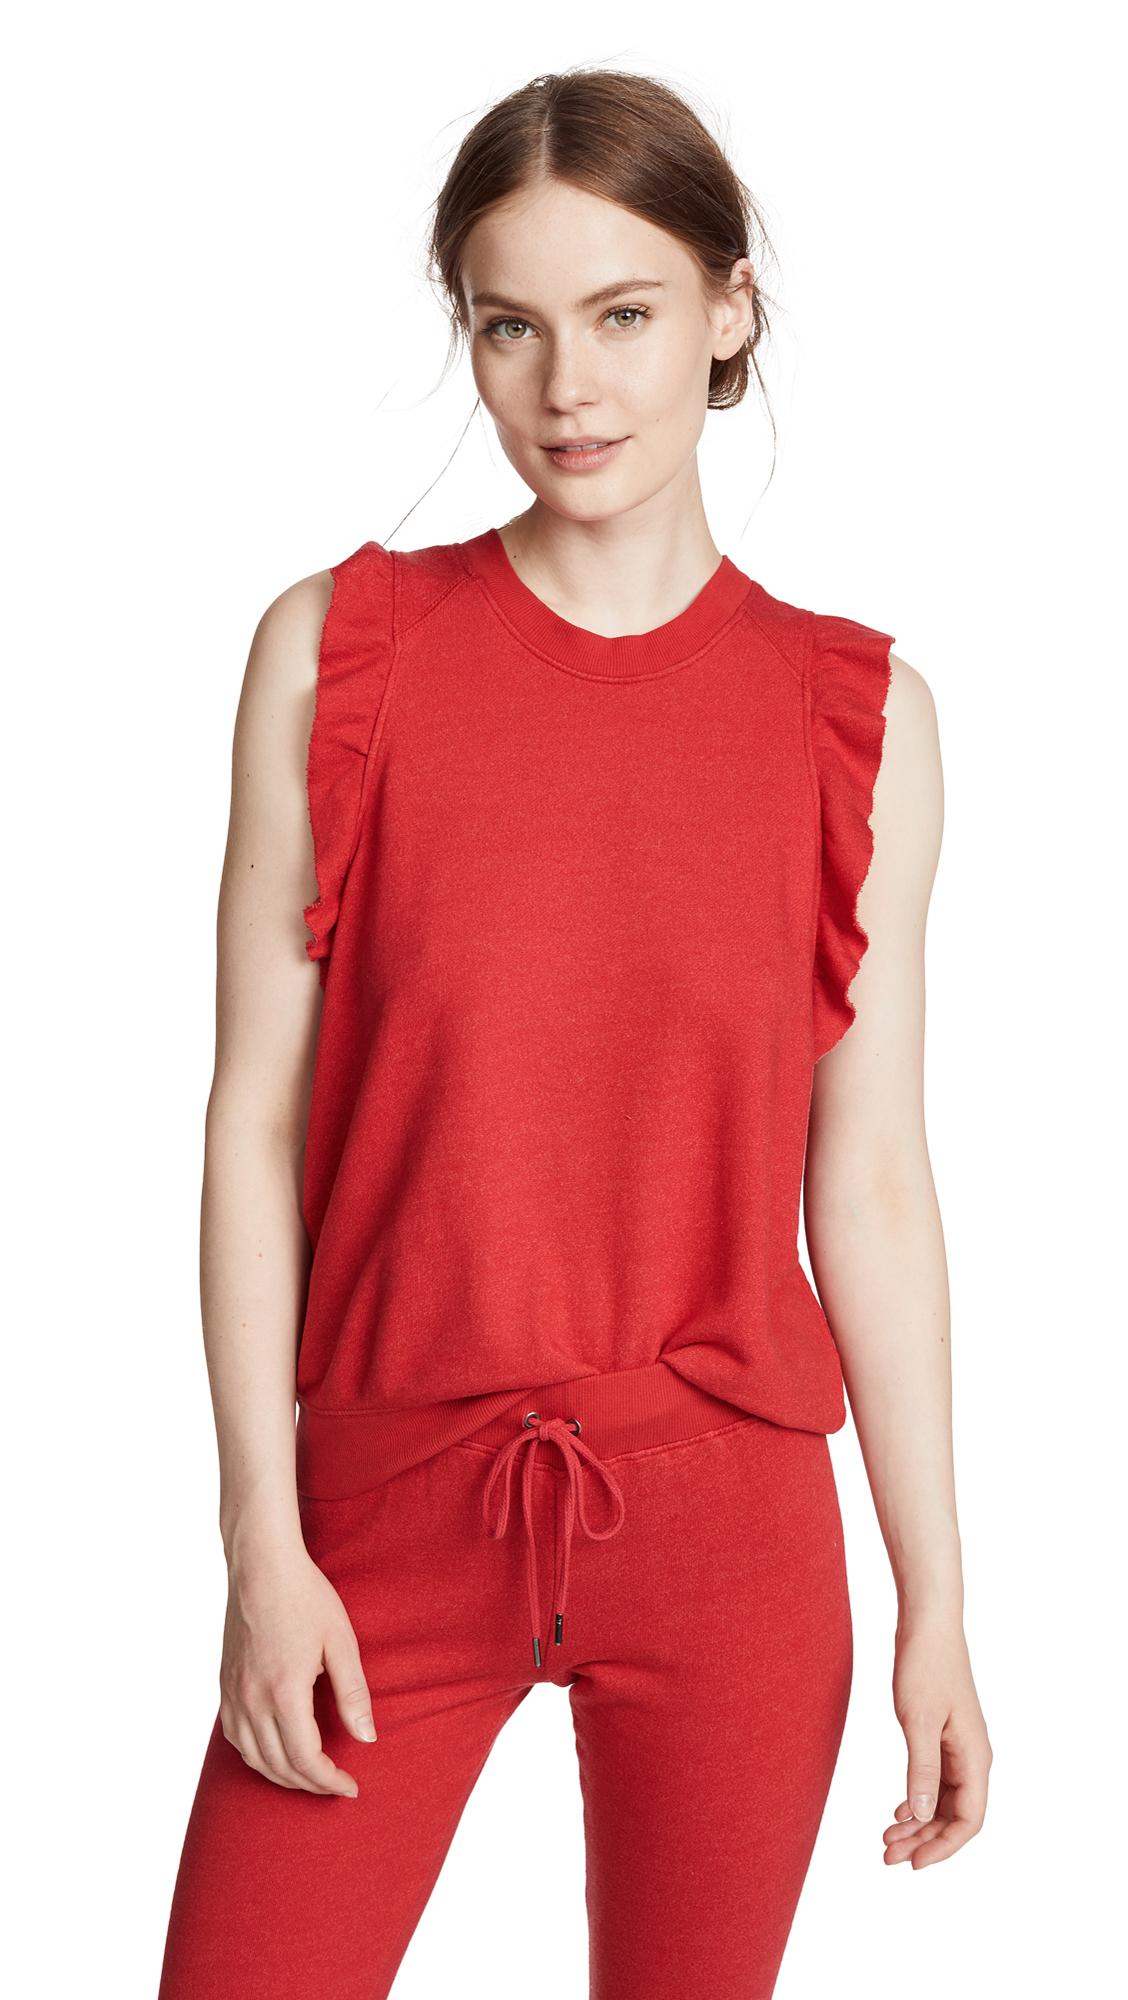 David Lerner Ruffle Sleeveless Pullover In Poppy